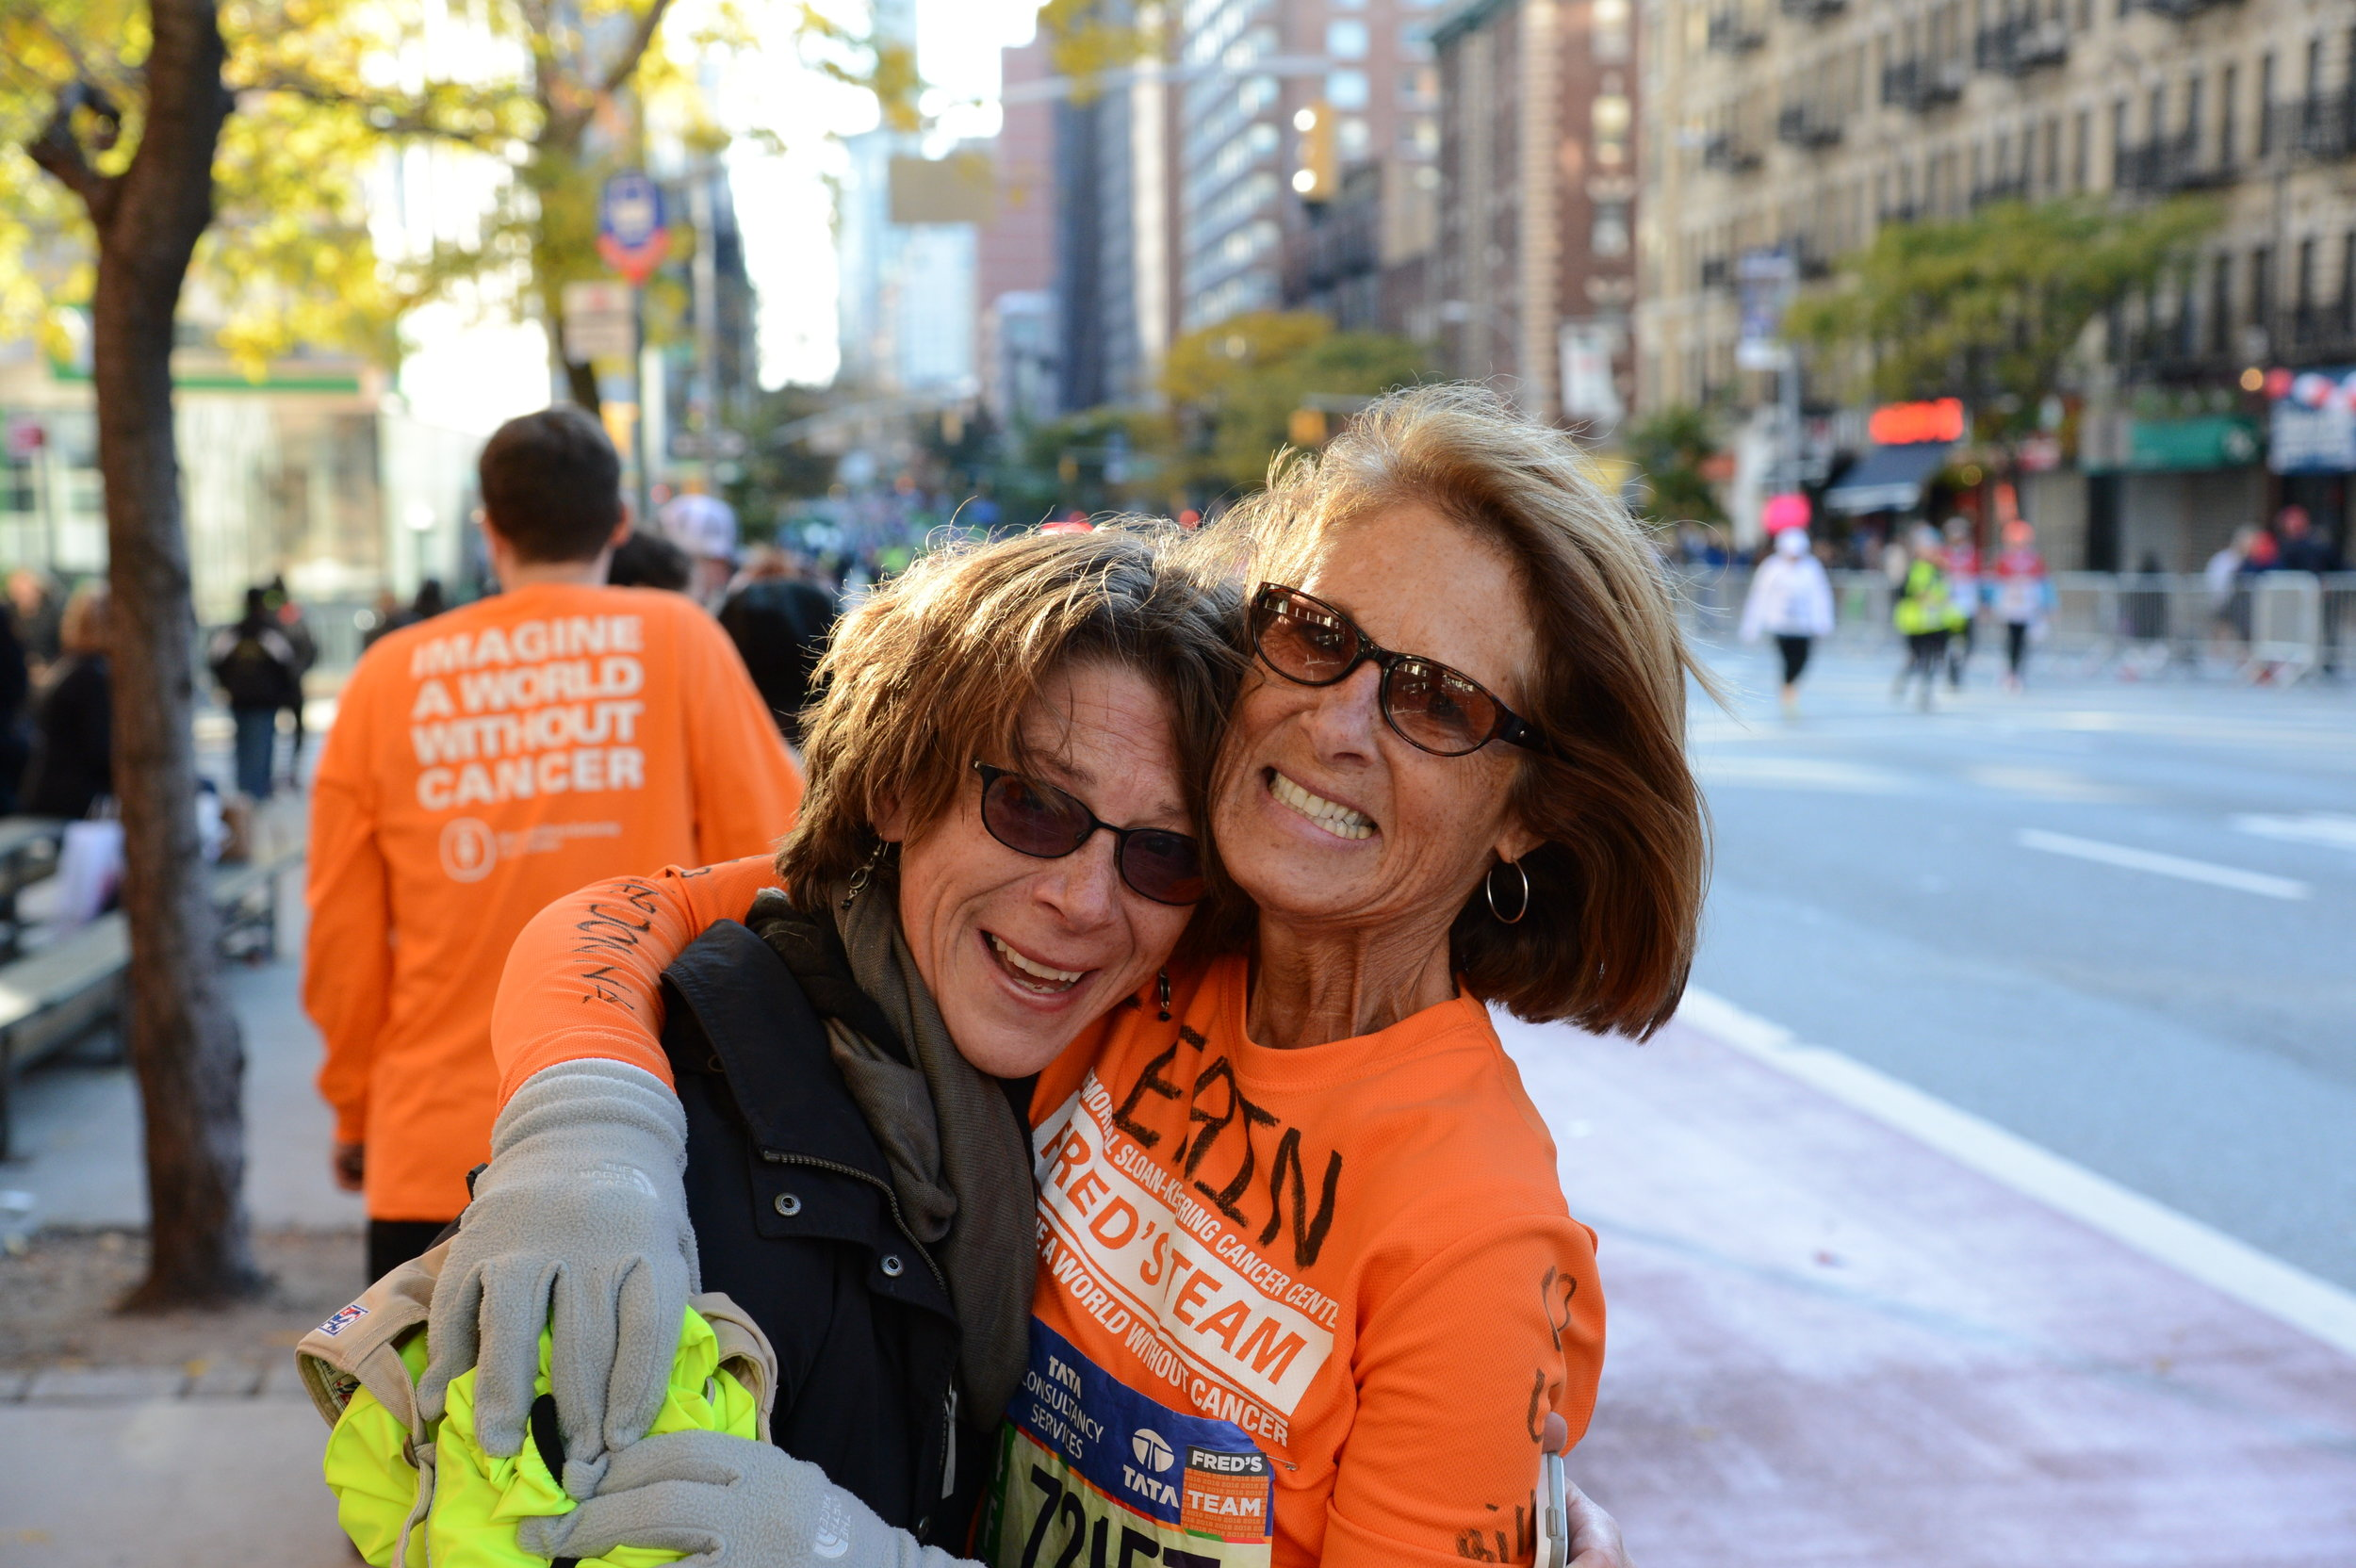 Karla Guererri and Erin Geddis Cummings, NYC Marathon- November 7, 2016